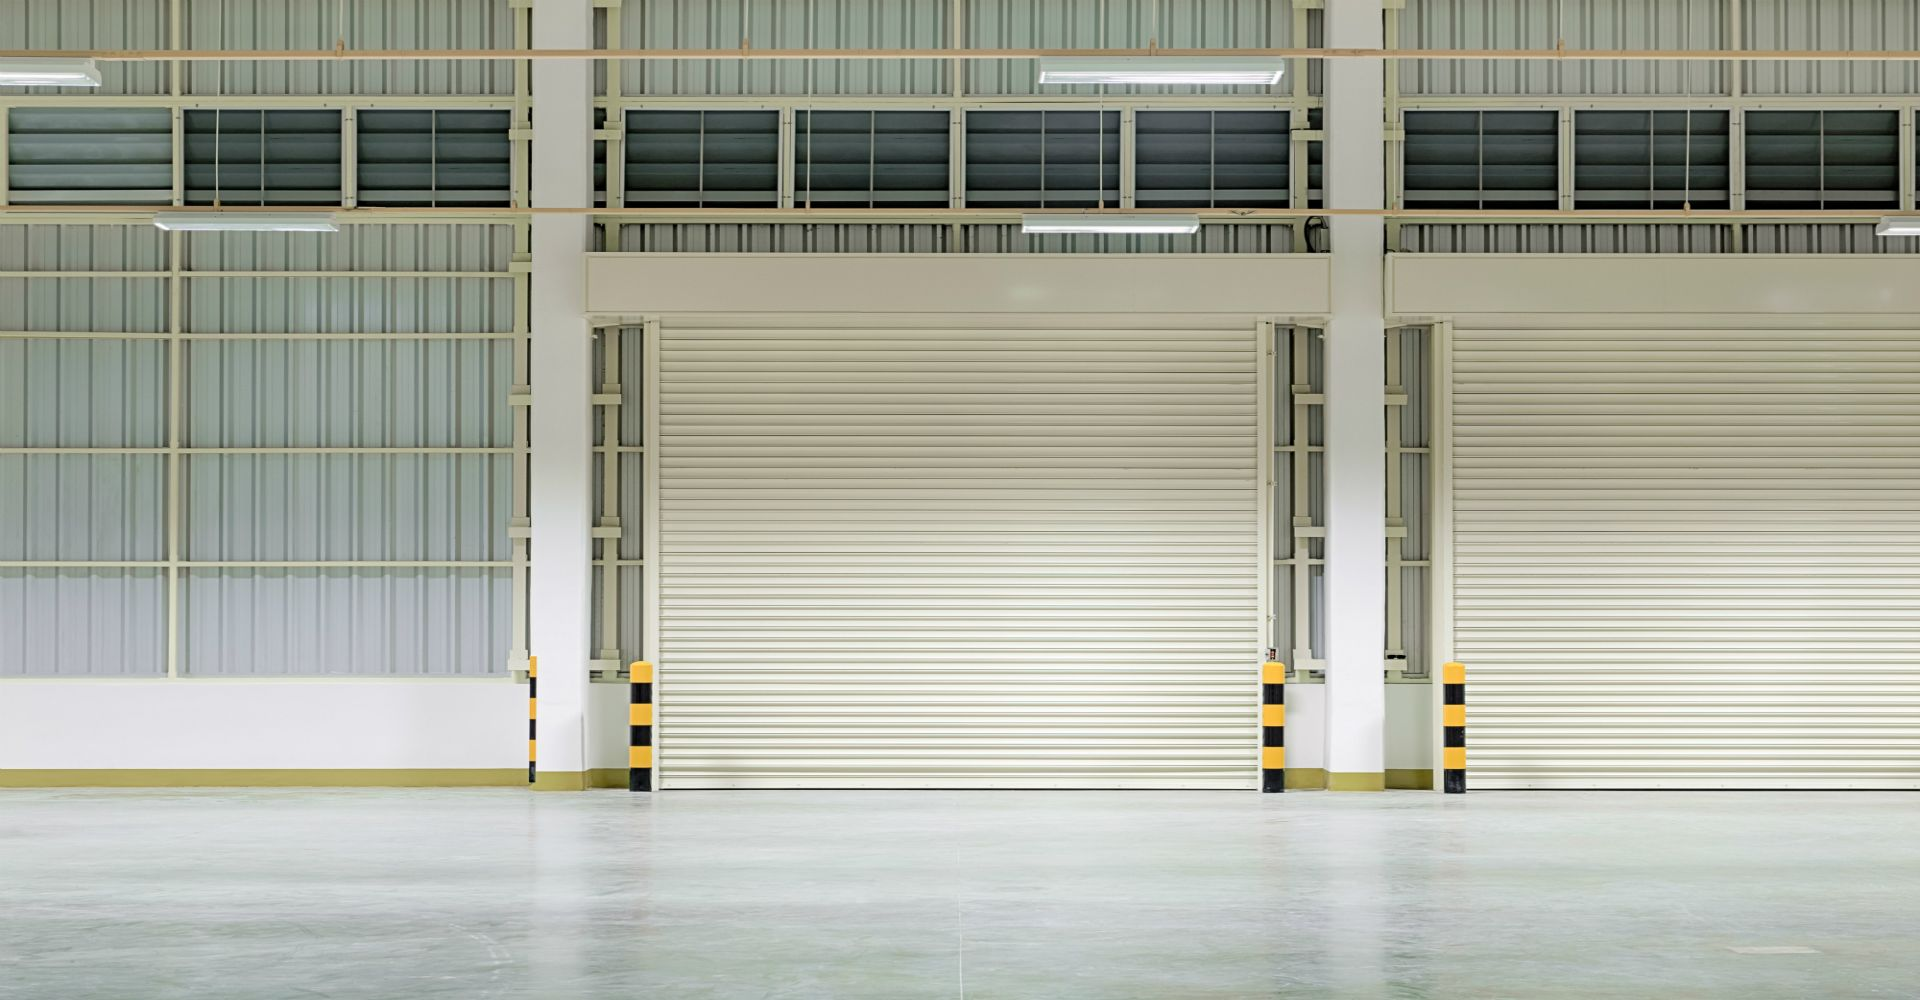 Commercial Door Installation Tips 4 Reasons To Install High Speed Doors Door Installation Garage Door Installation Commercial Overhead Door